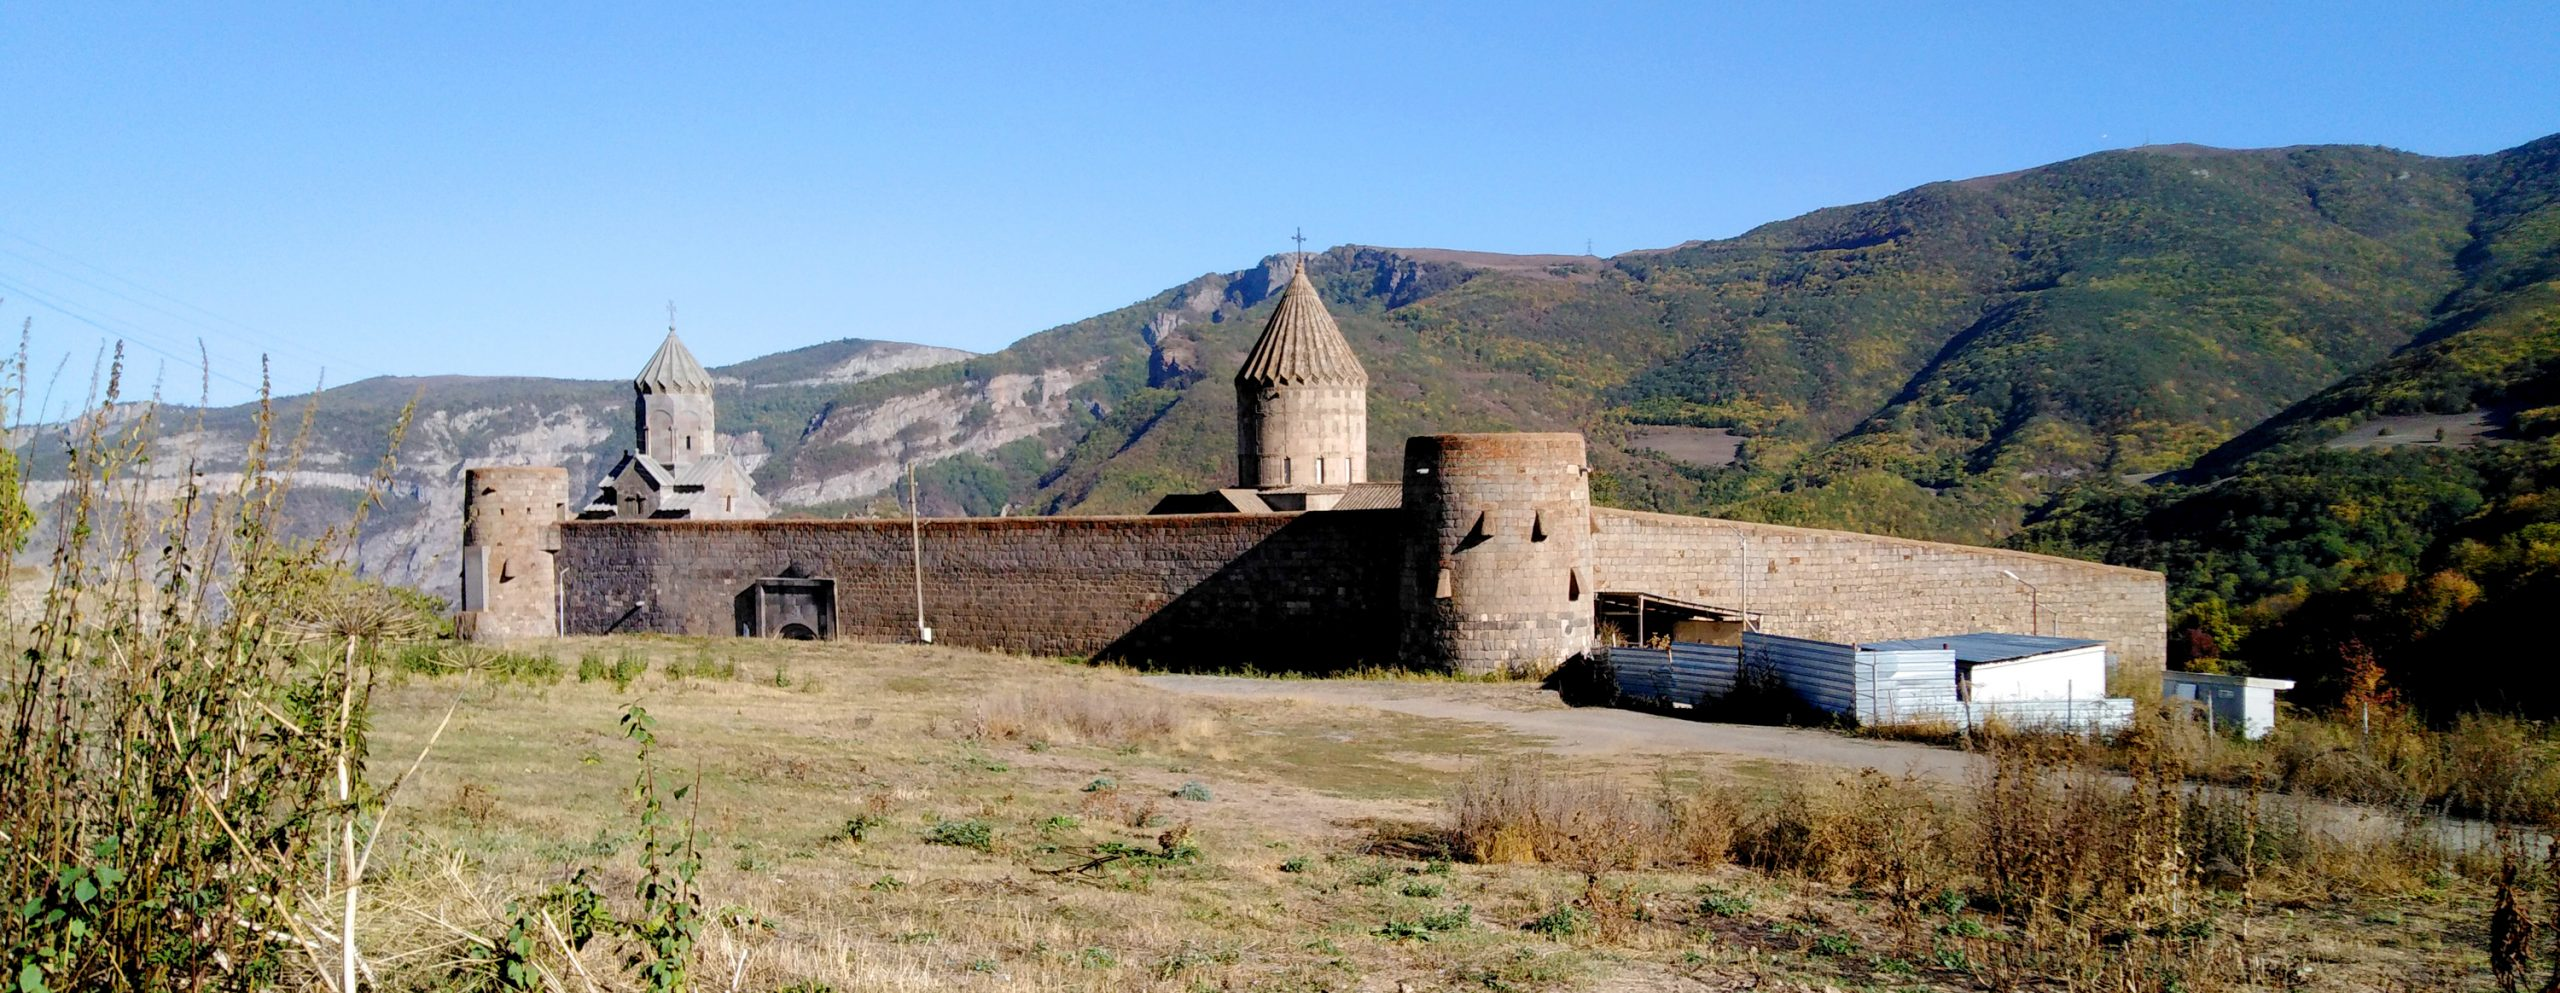 Armenien bogdanova becker